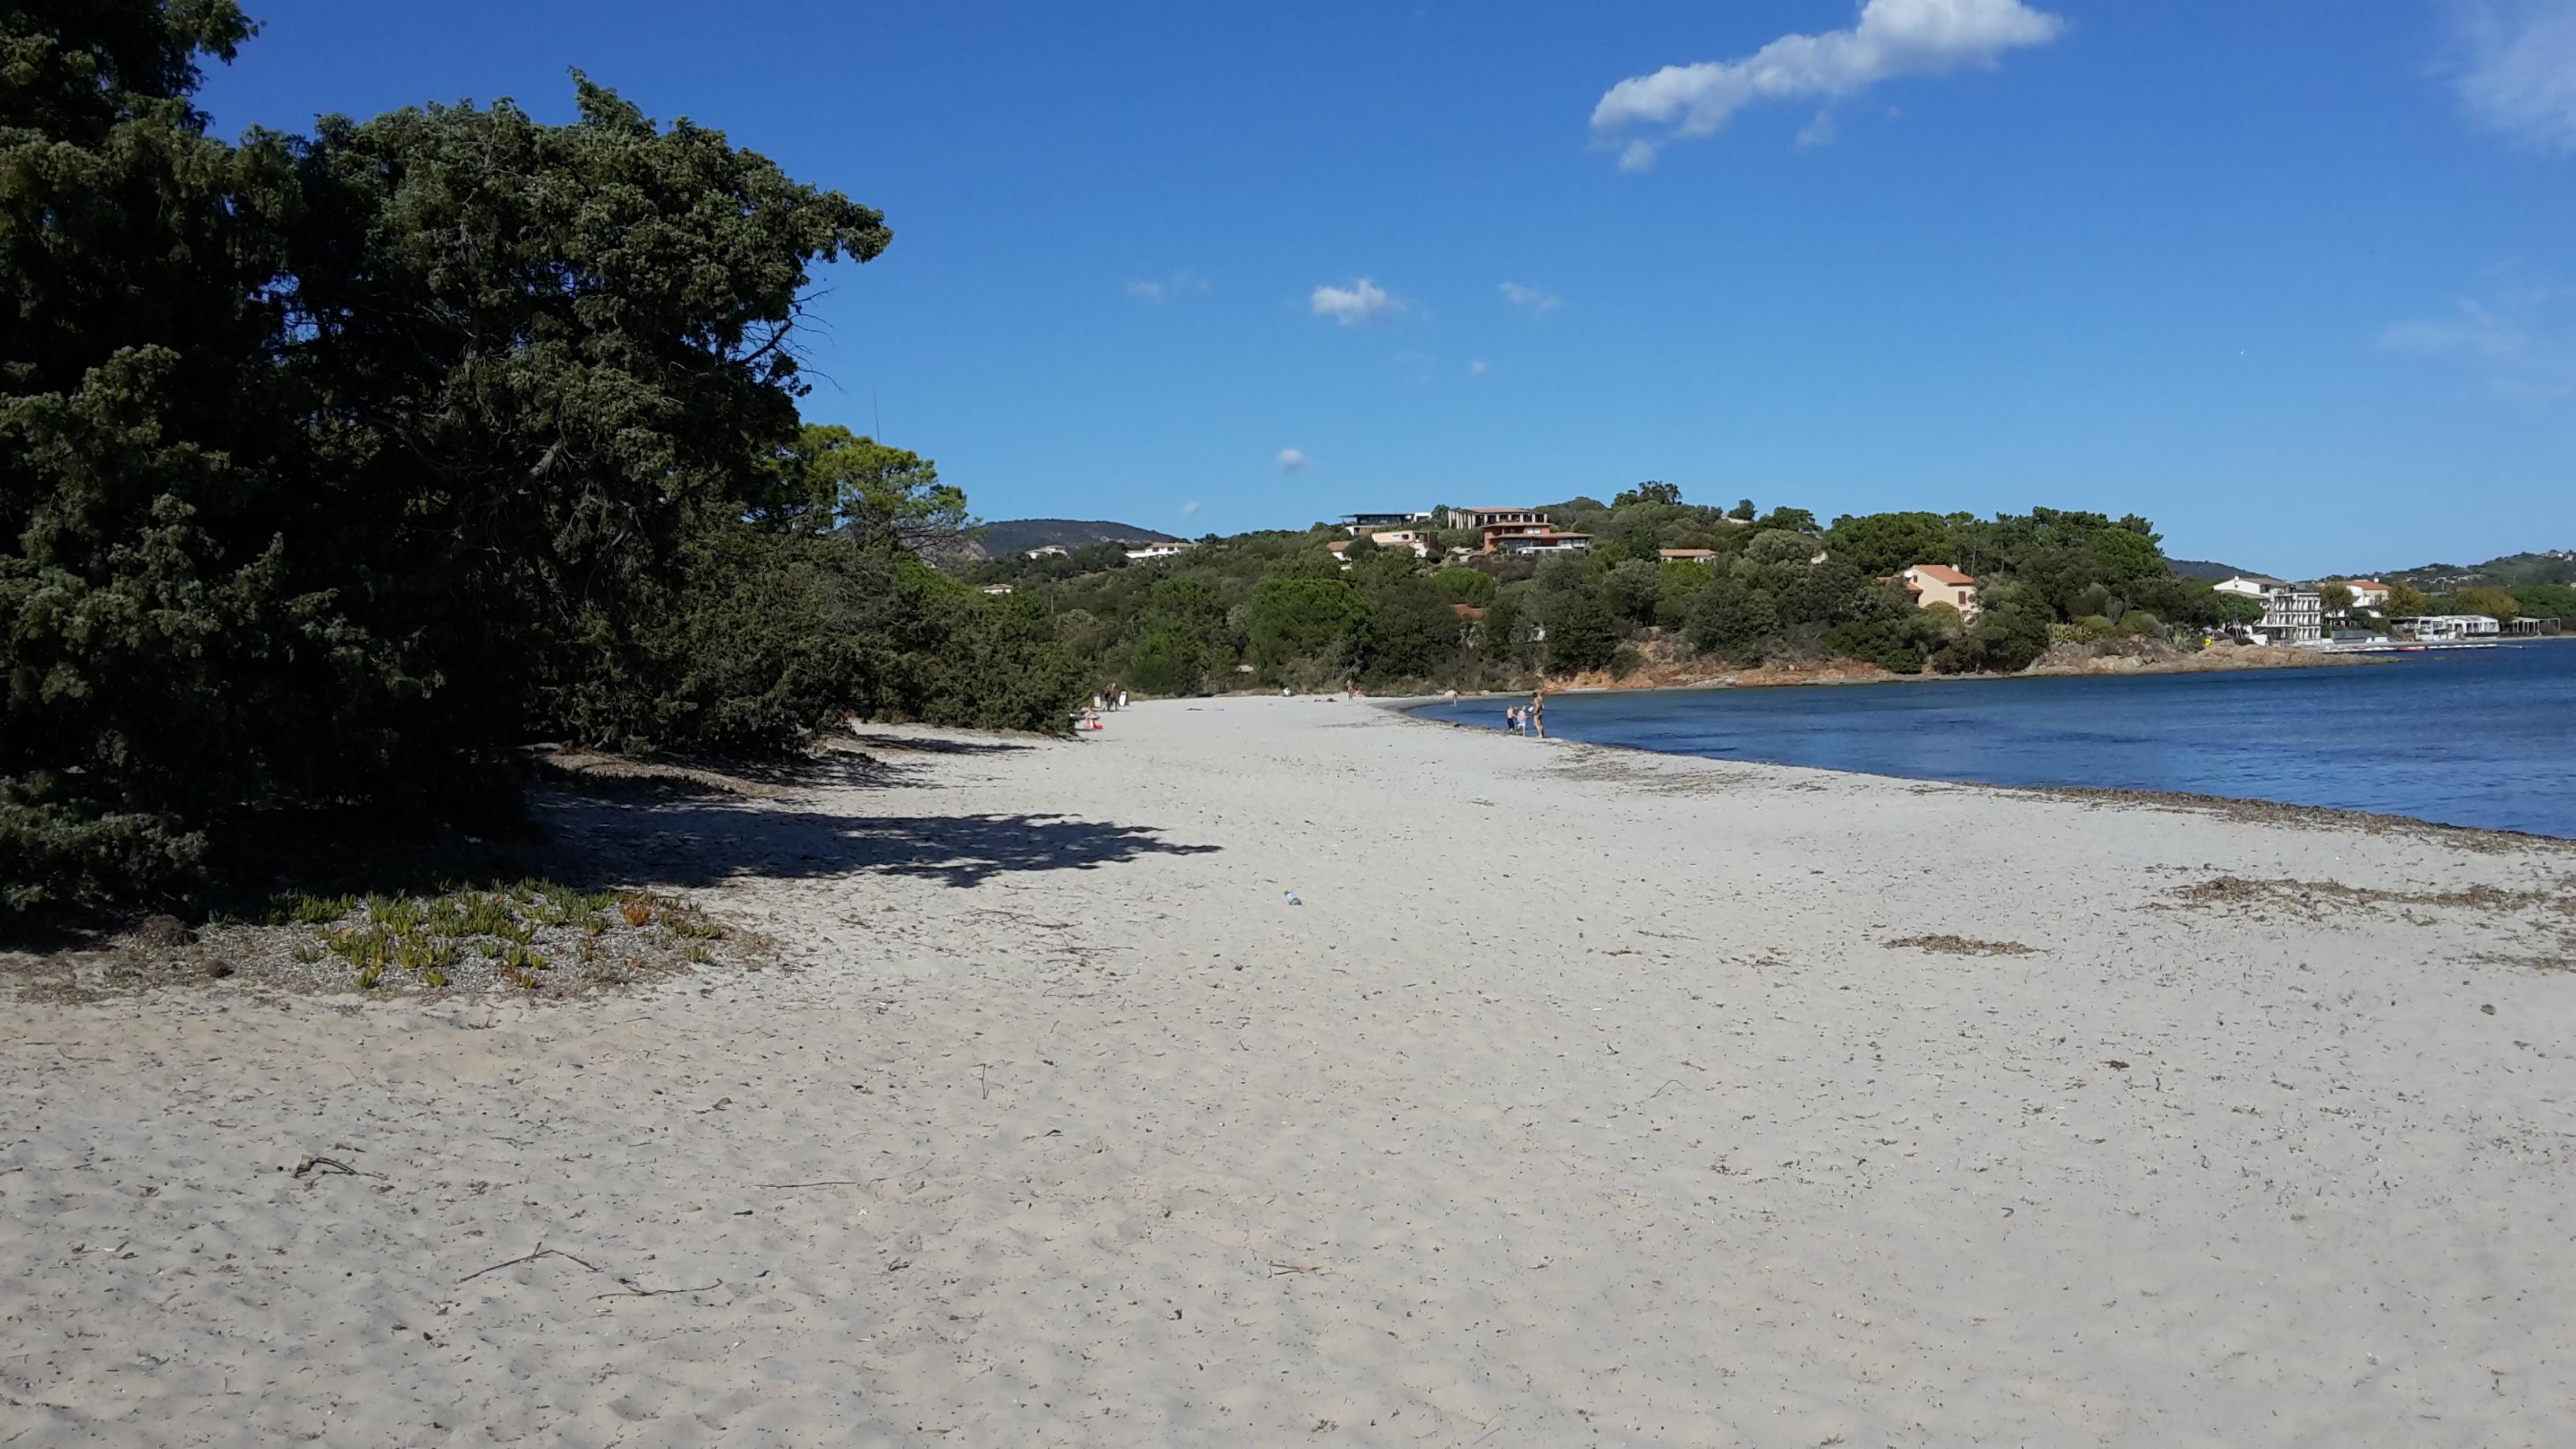 Fewo Korsika strandnah